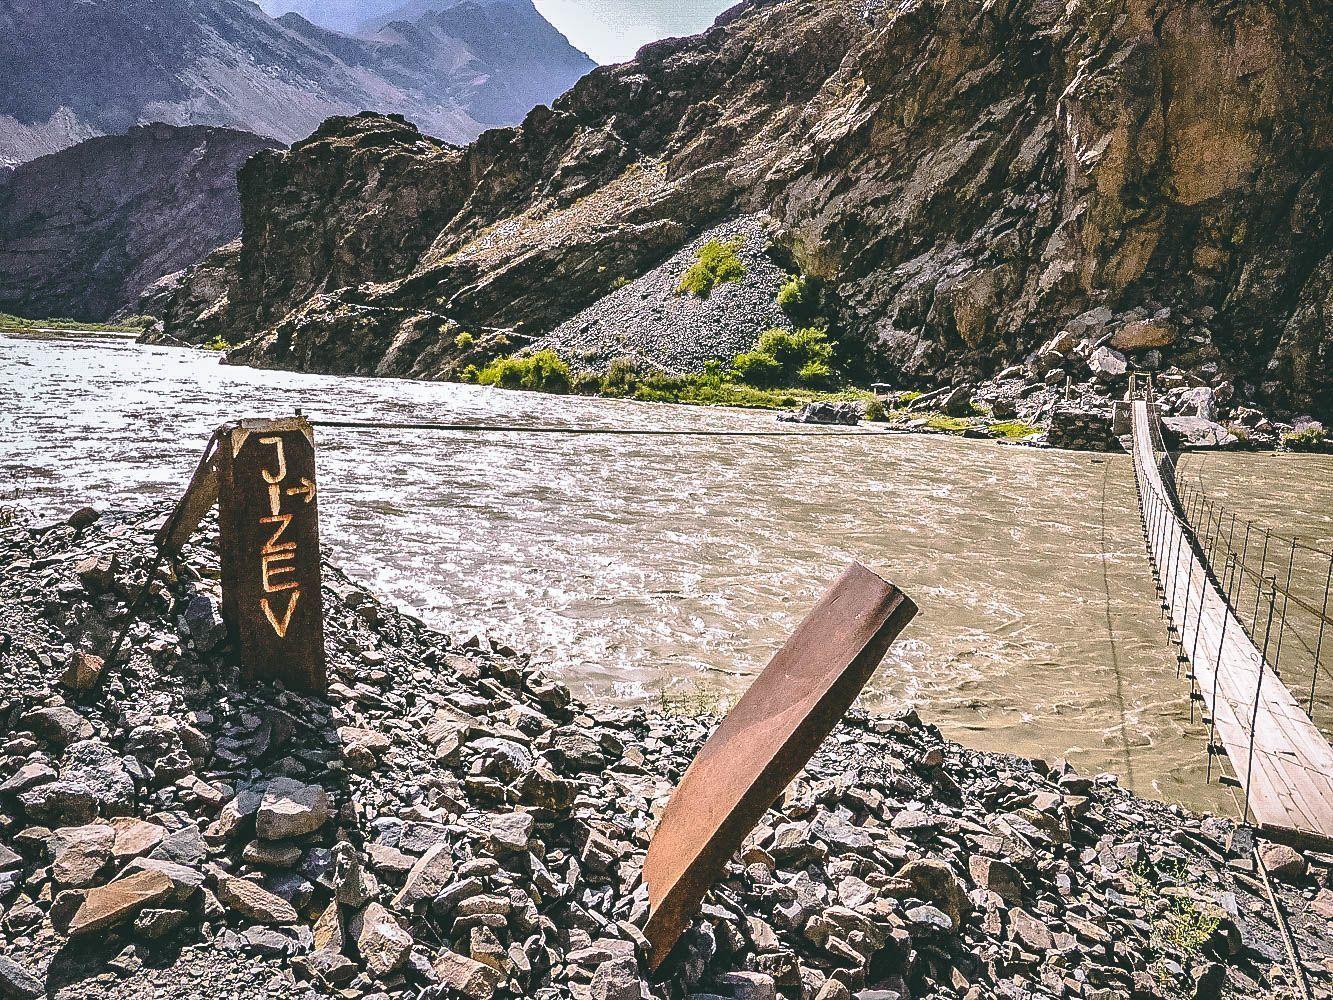 Trekking Tour im Jisew-Tal, Pamir-Highway, Tadschikistan